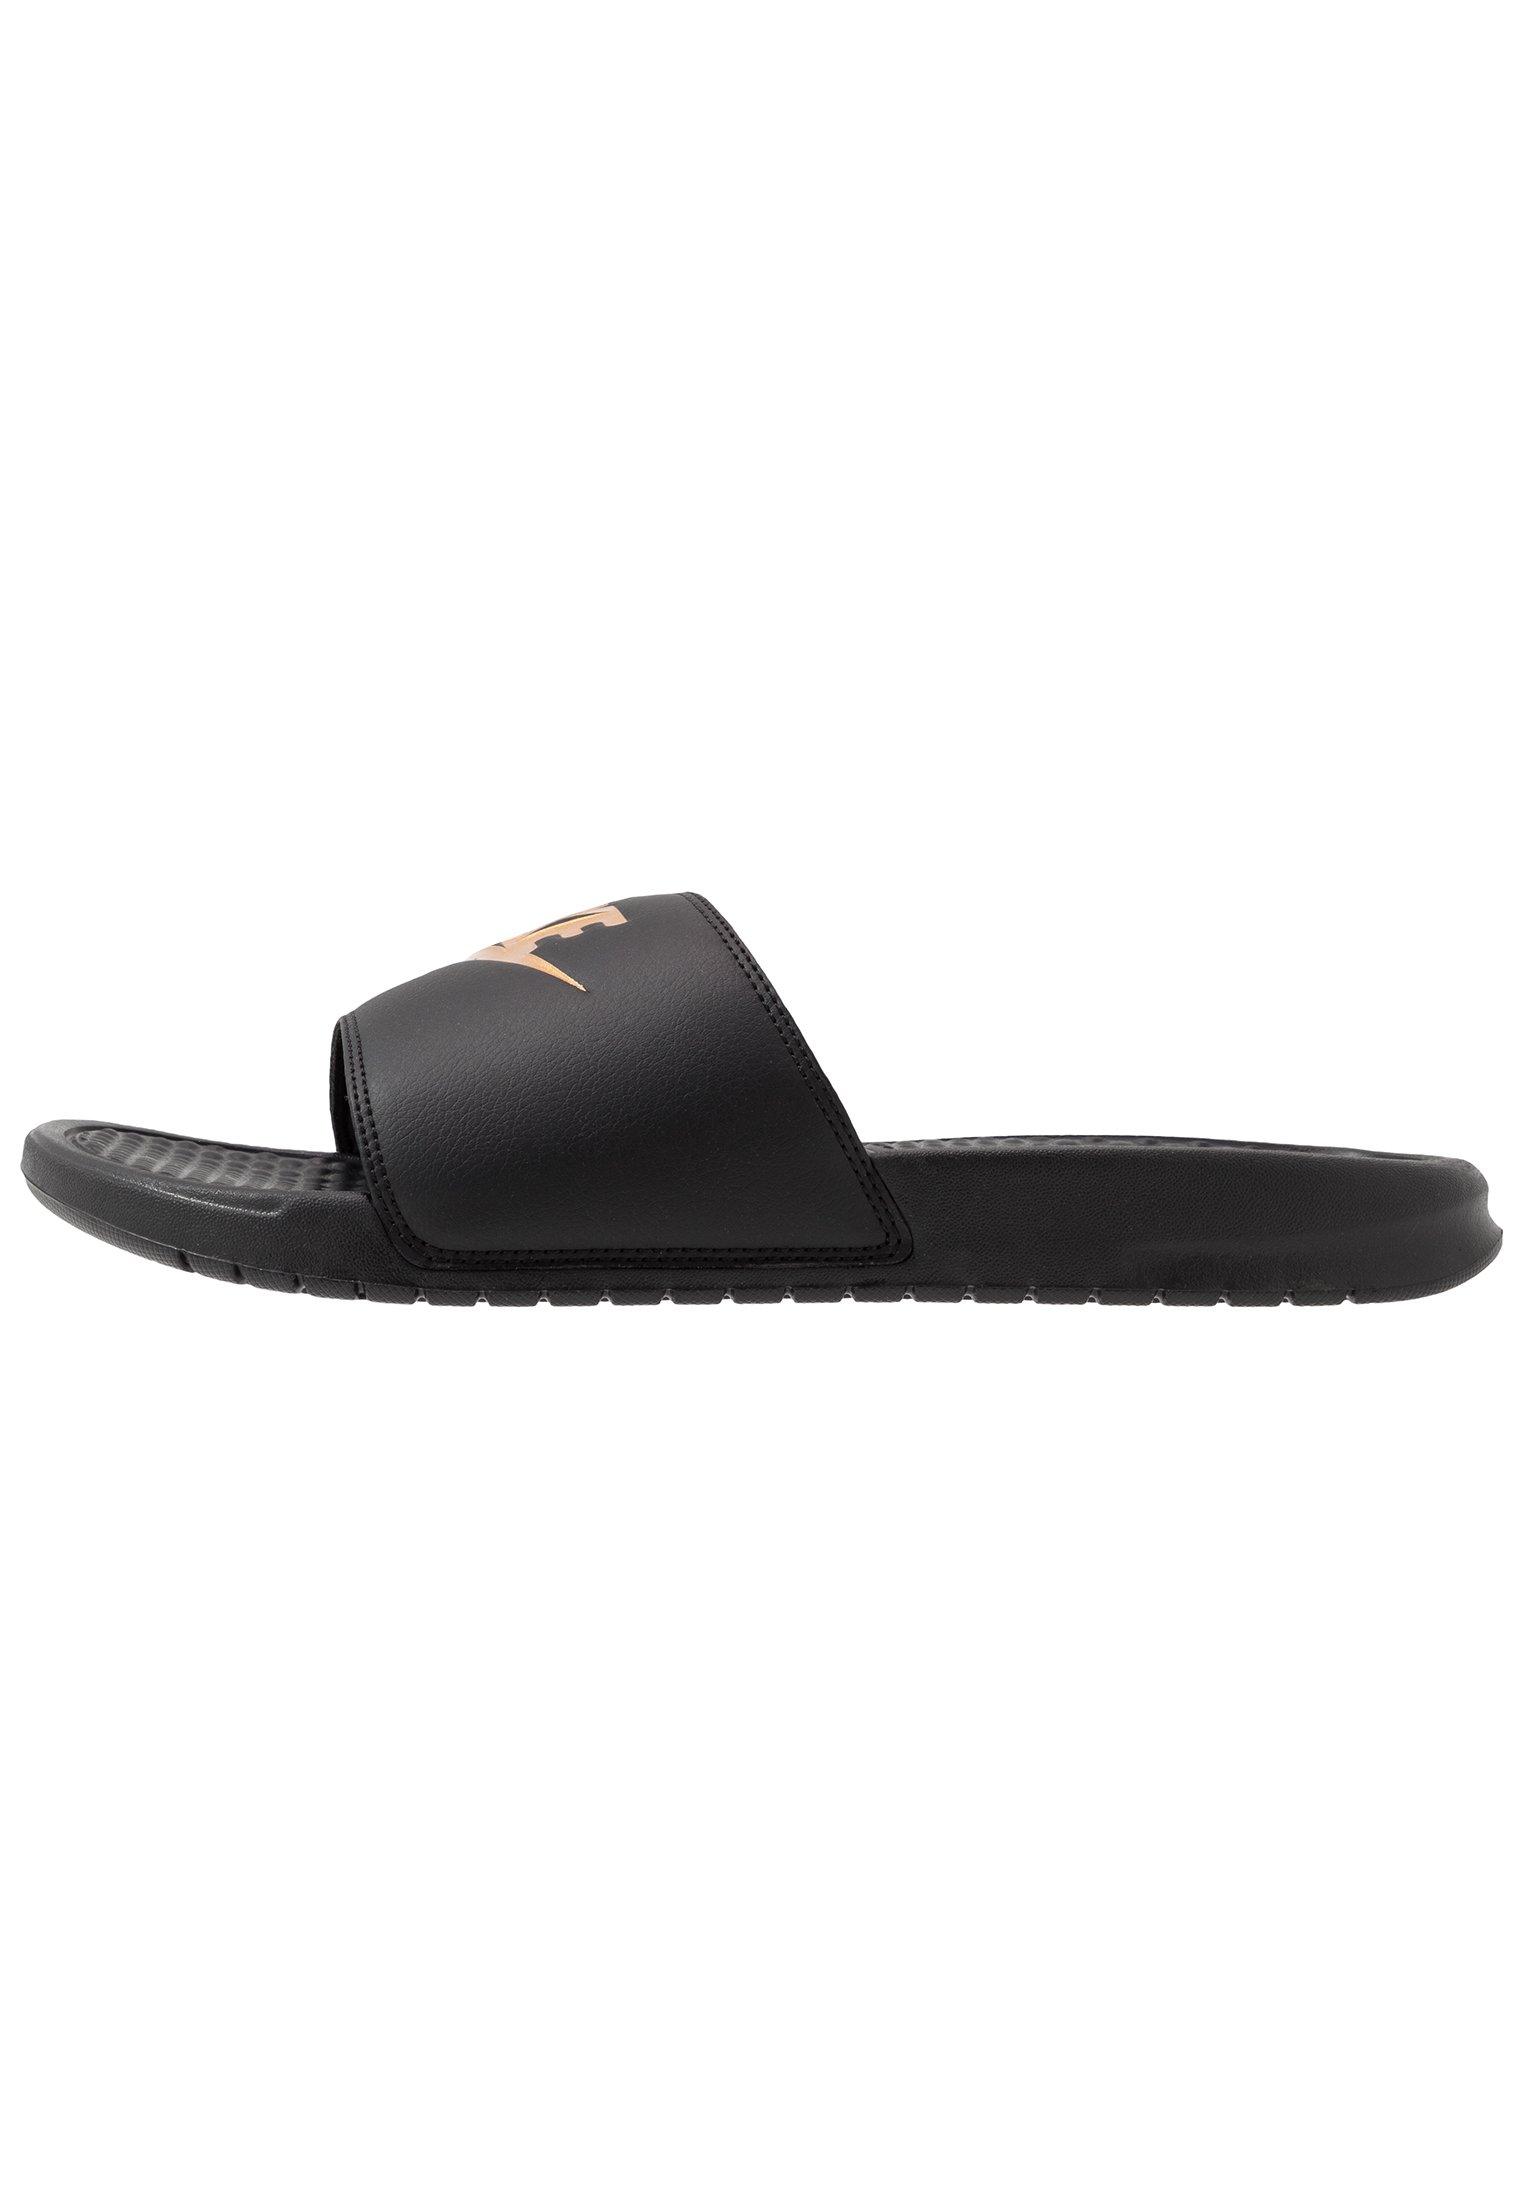 chaussures de plage nike homme